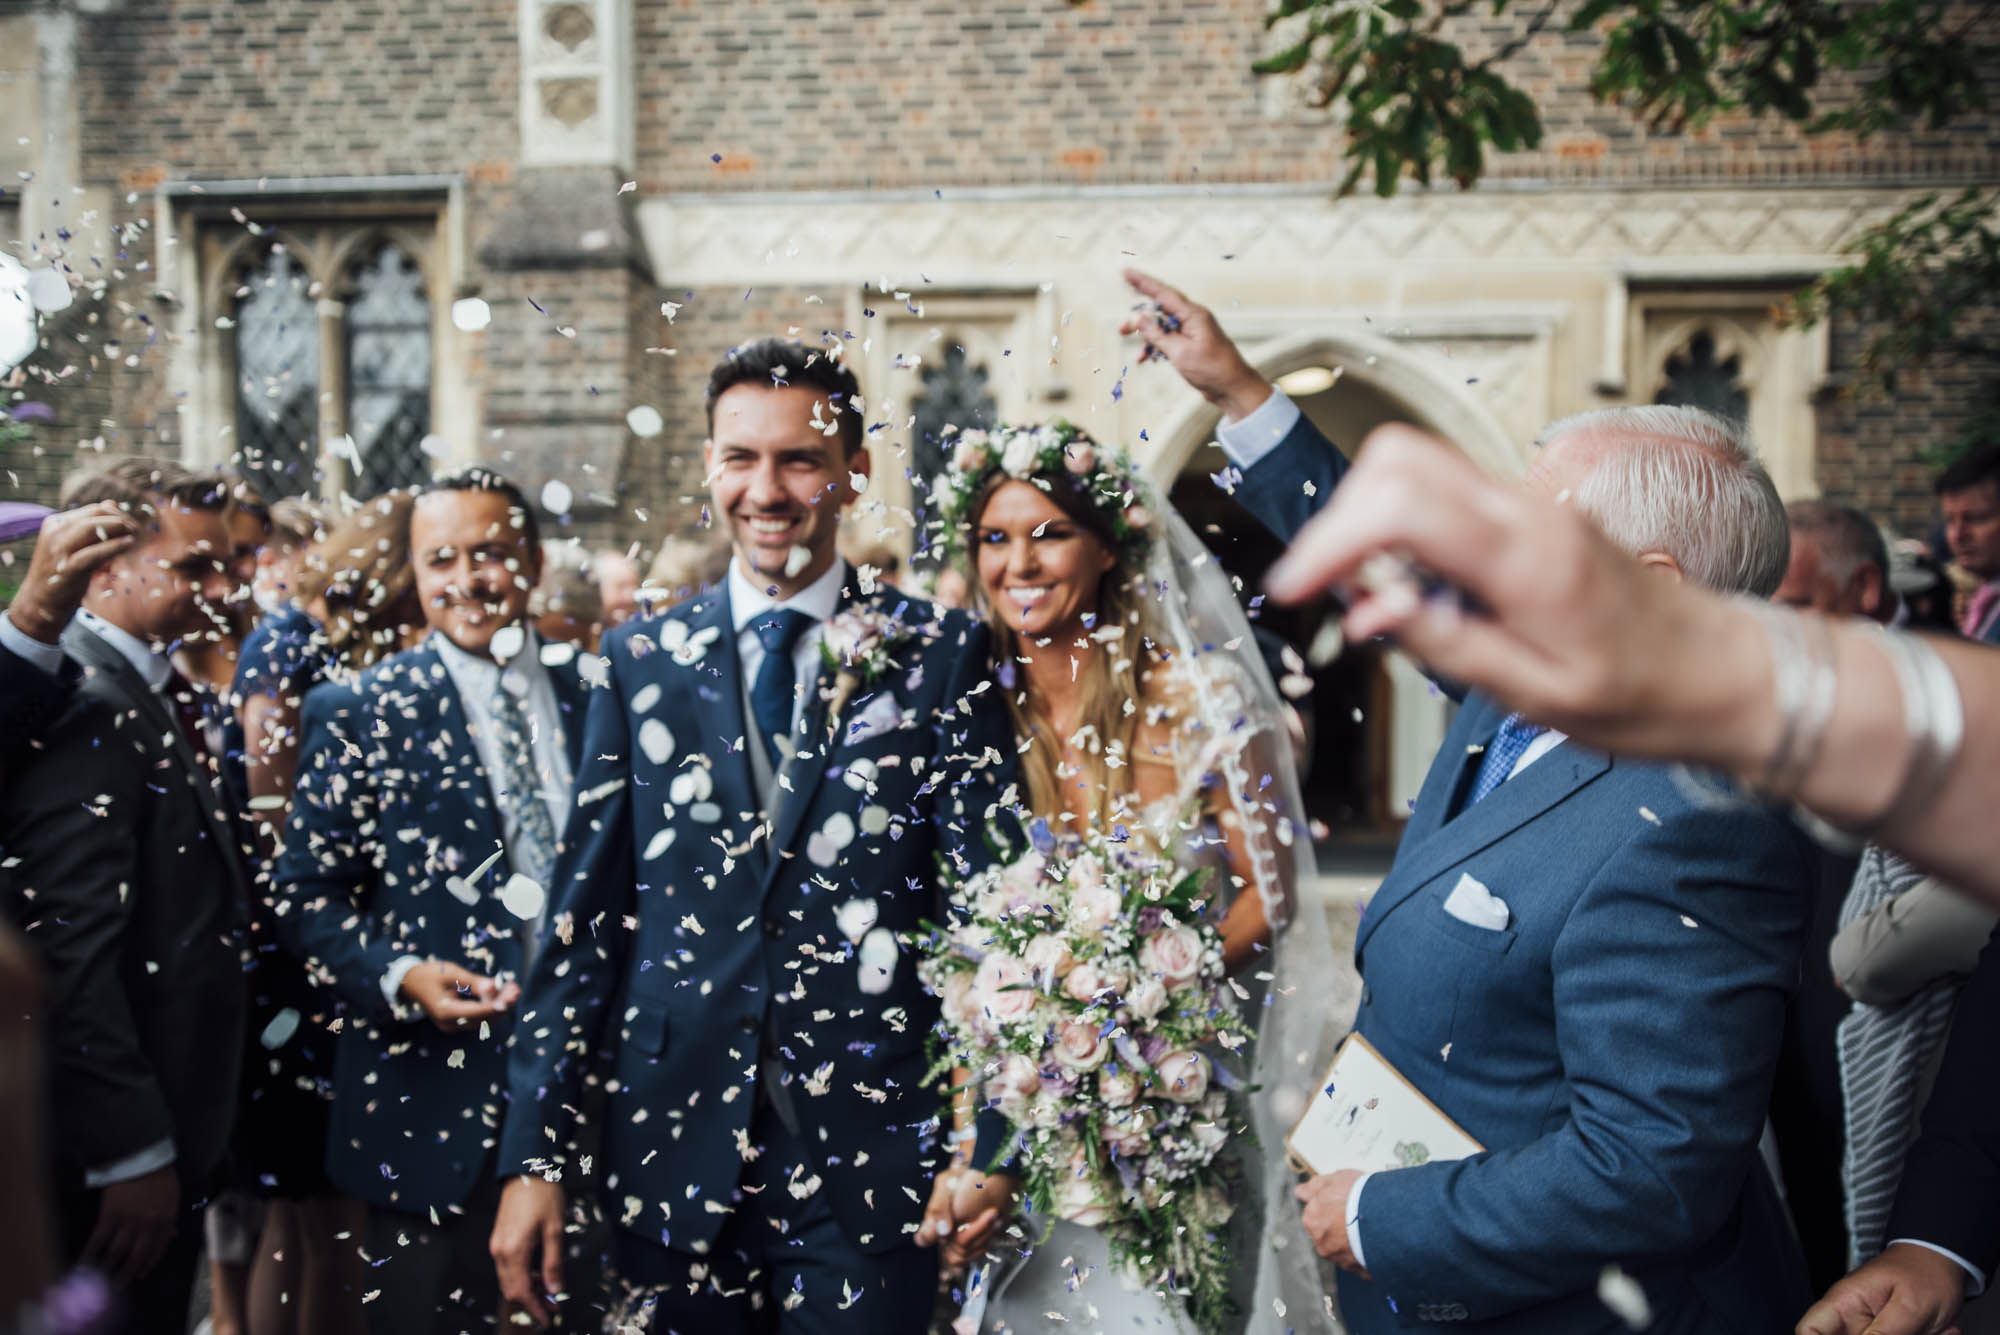 Essex Wedding Bride & Groom with confetti